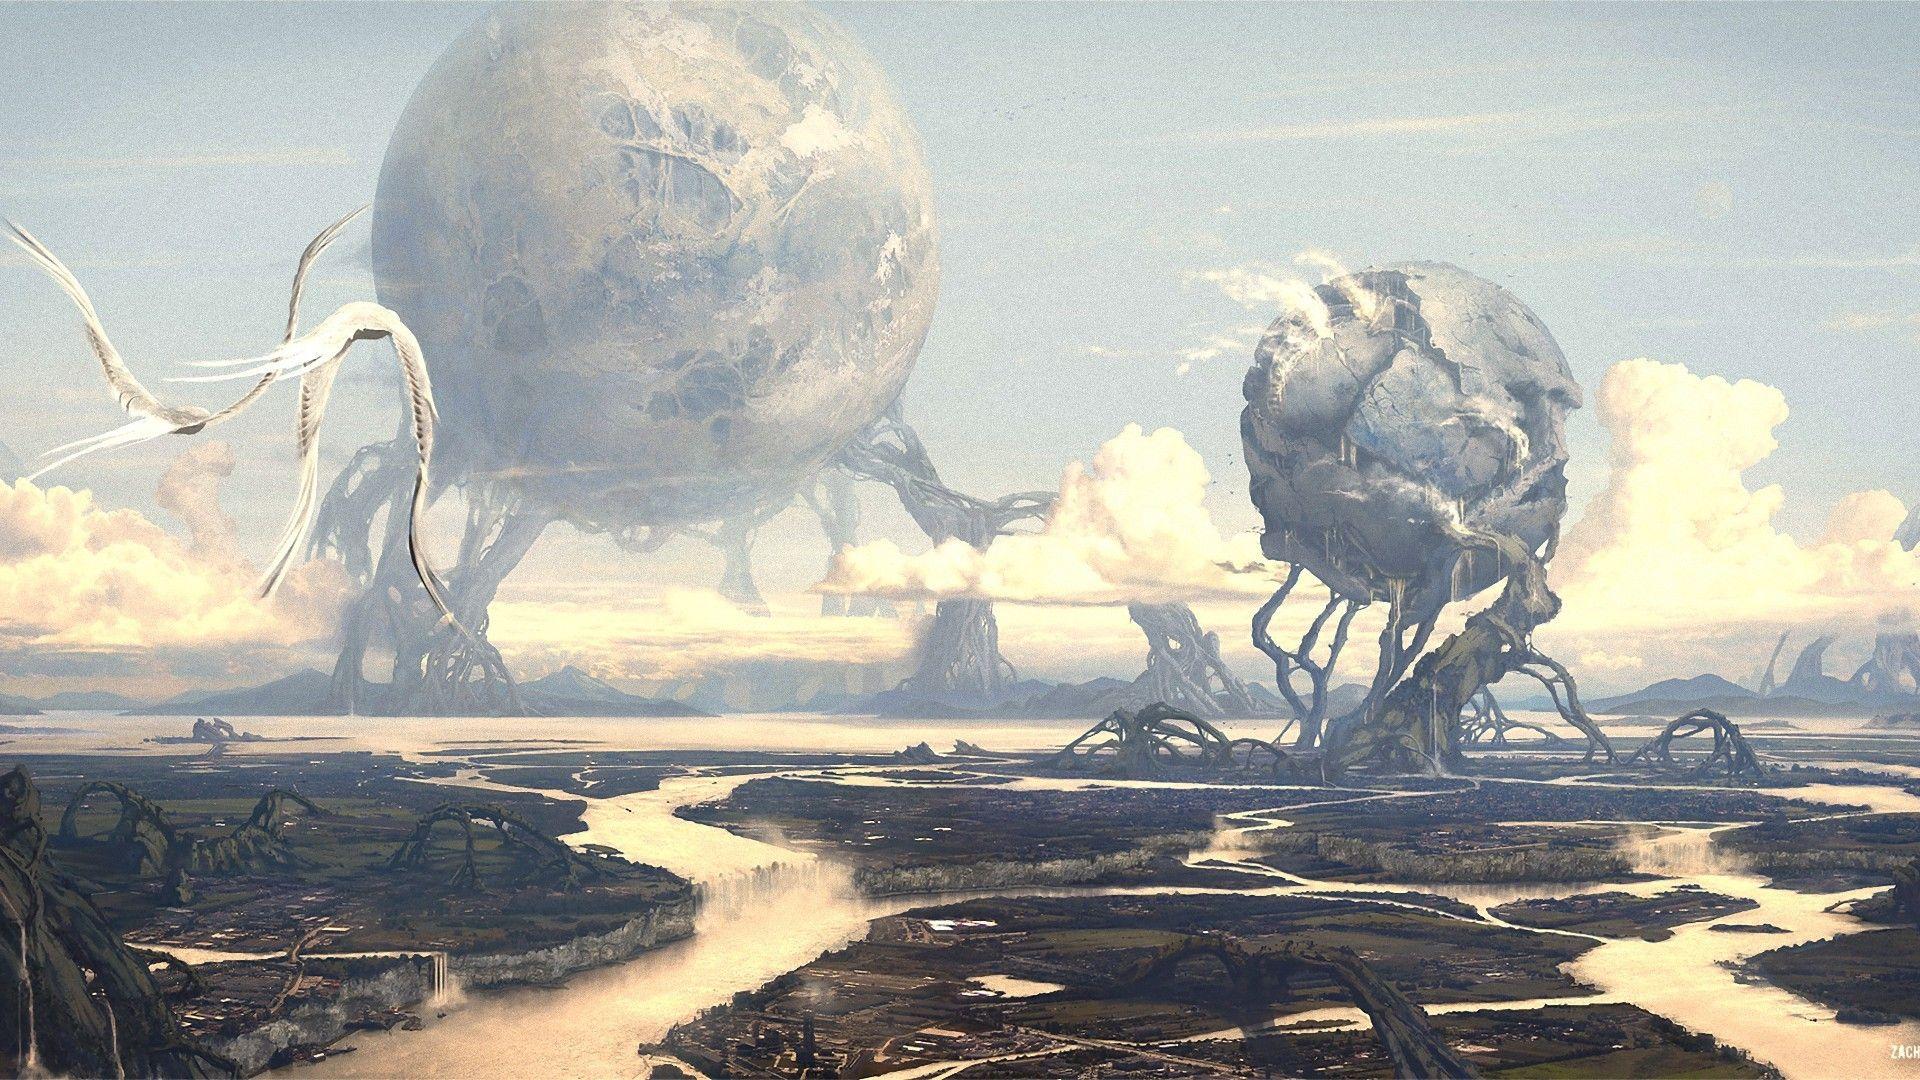 Sci Fi Landscape Wallpaper Art World Fantasy Art World Wallpaper